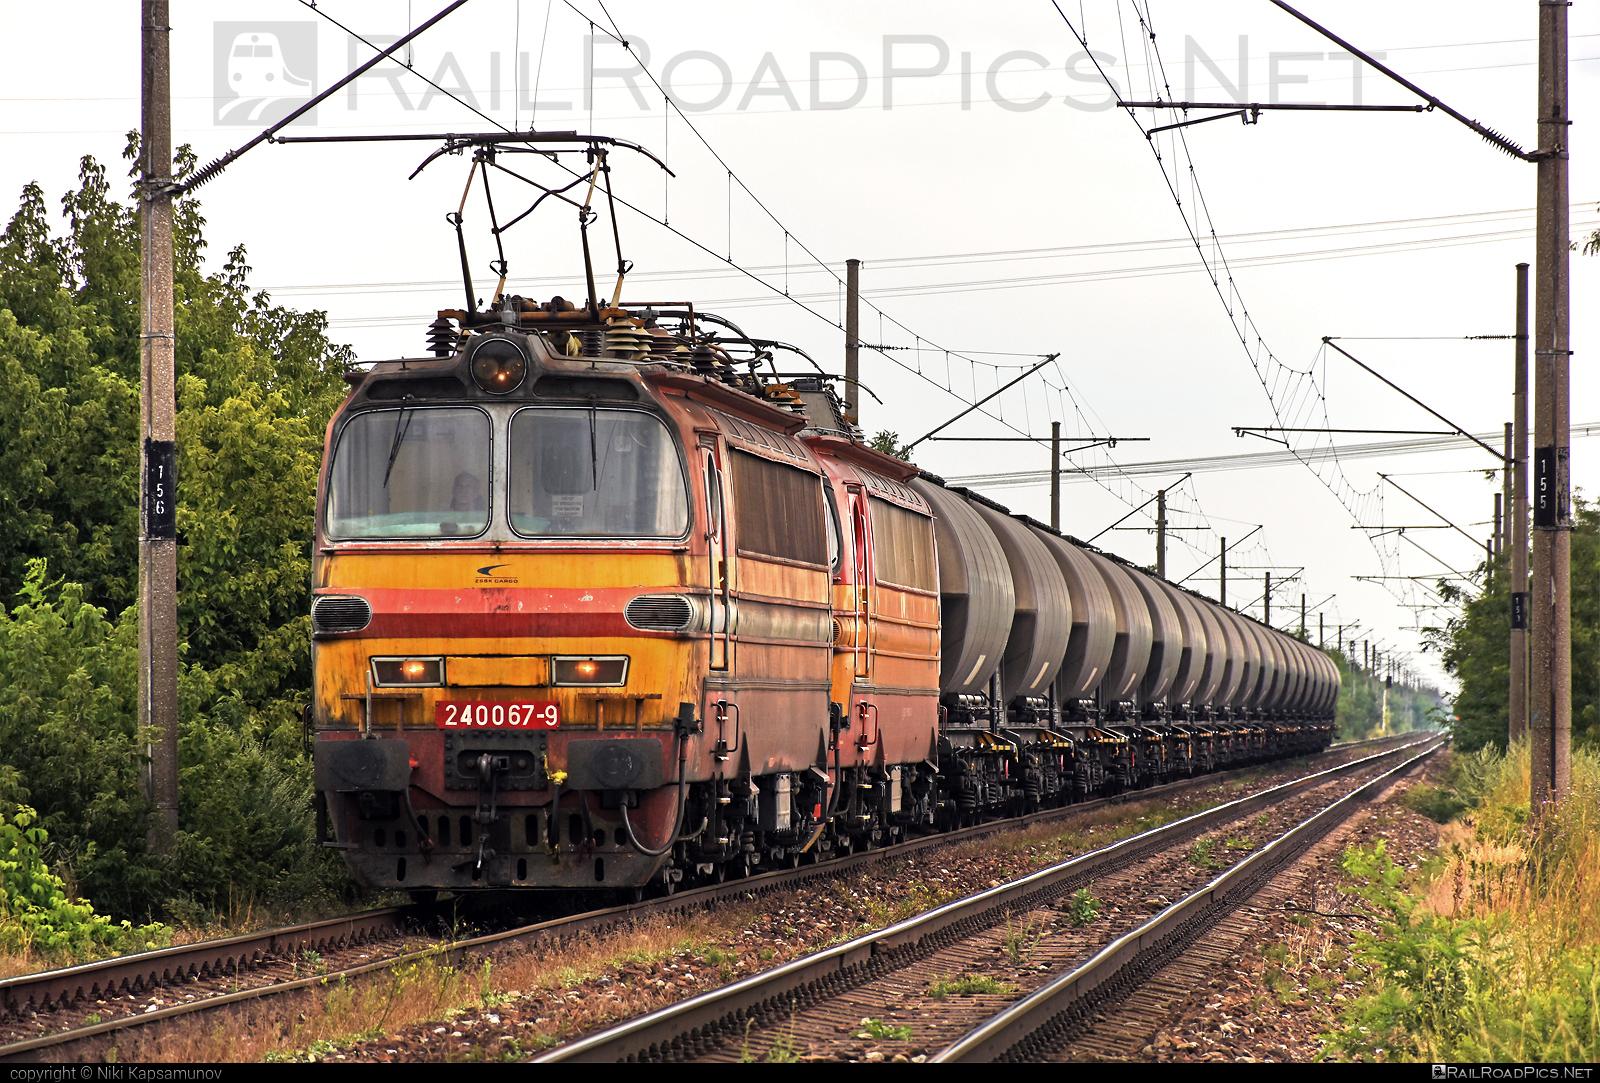 Škoda 47E - 240 067-9 operated by Železničná Spoločnost' Cargo Slovakia a.s. #ZeleznicnaSpolocnostCargoSlovakia #kesselwagen #laminatka #locomotive240 #skoda #skoda47e #tankwagon #zsskcargo